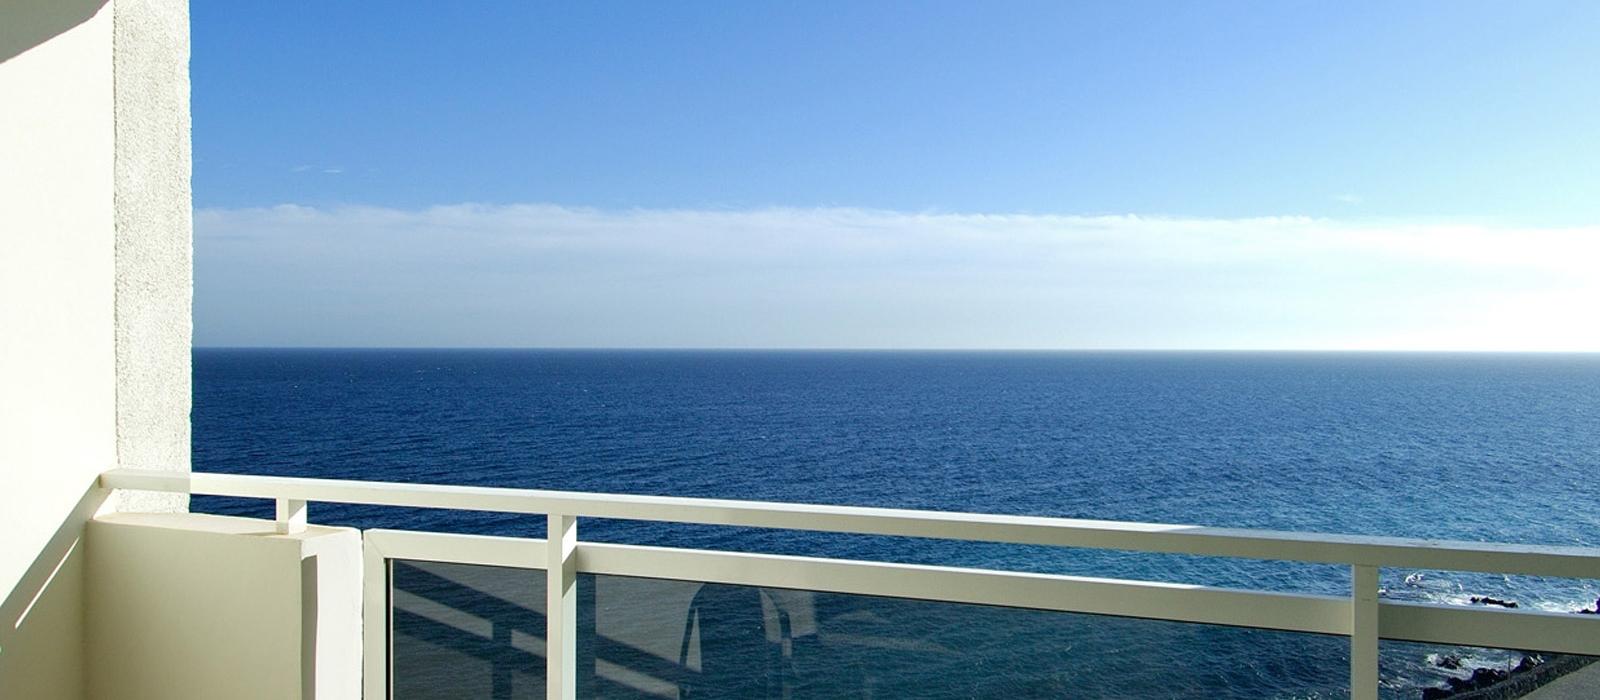 Habitación doble superior. Hotel Tenerife Golf - Vincci Hoteles